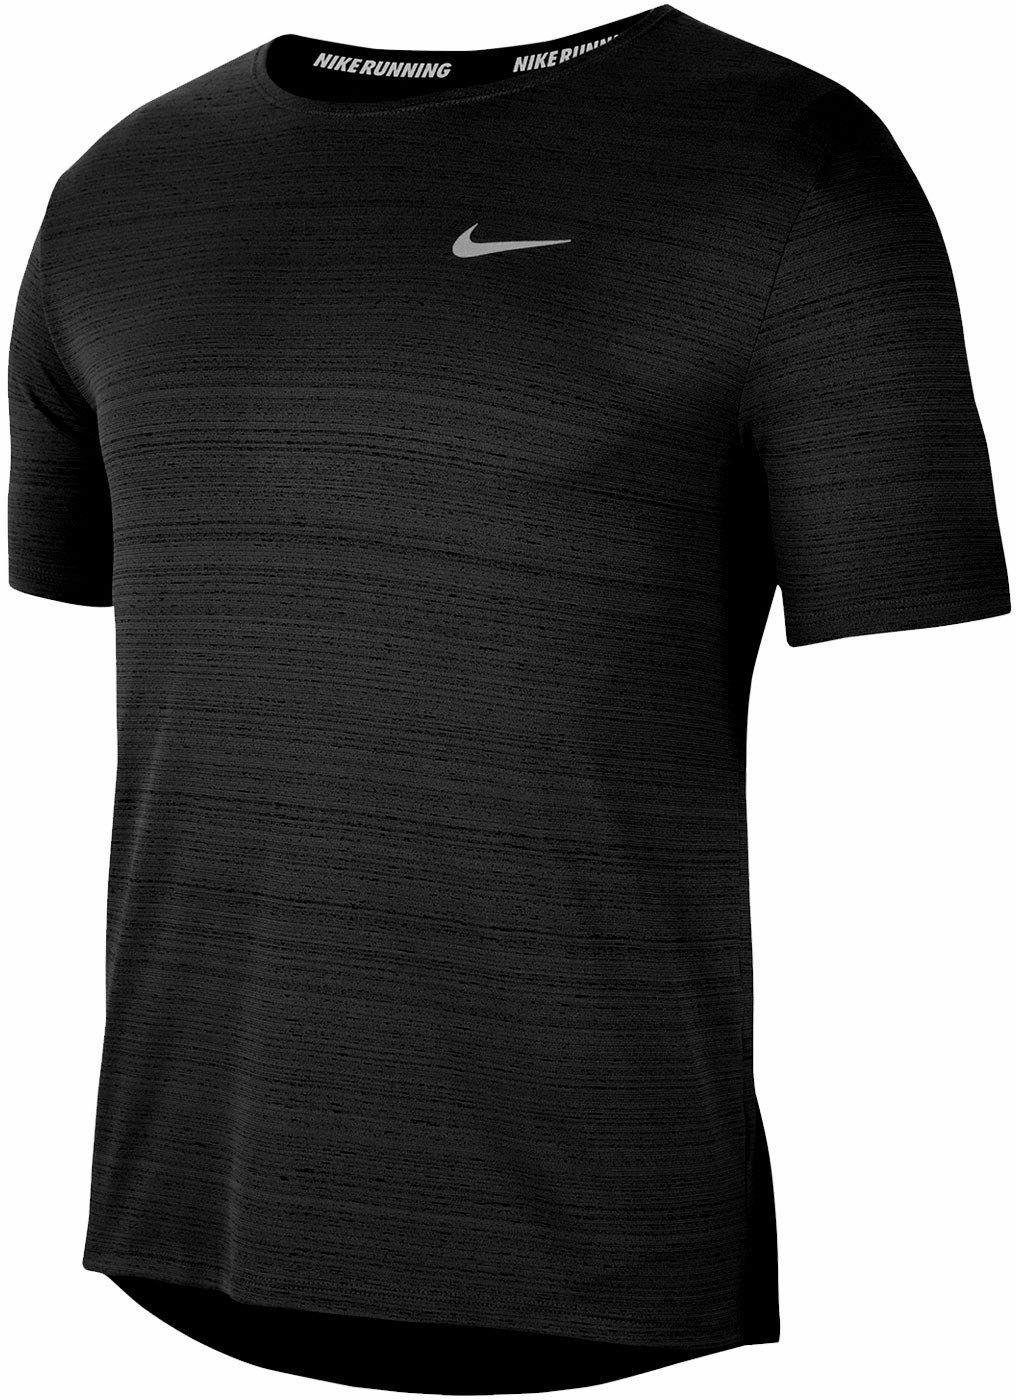 Nike Koszulka męska M Nk Df Miler Top Ss Czarny (odblaskowy srebro) L